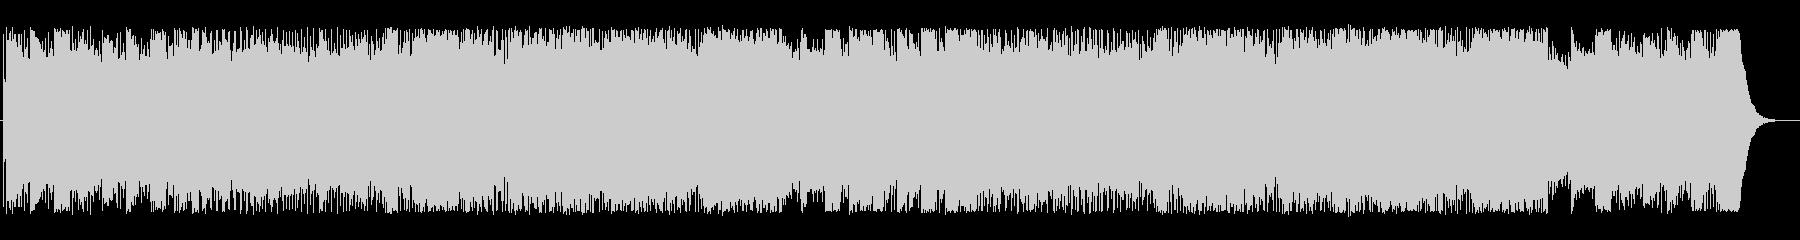 Time Lapseの未再生の波形